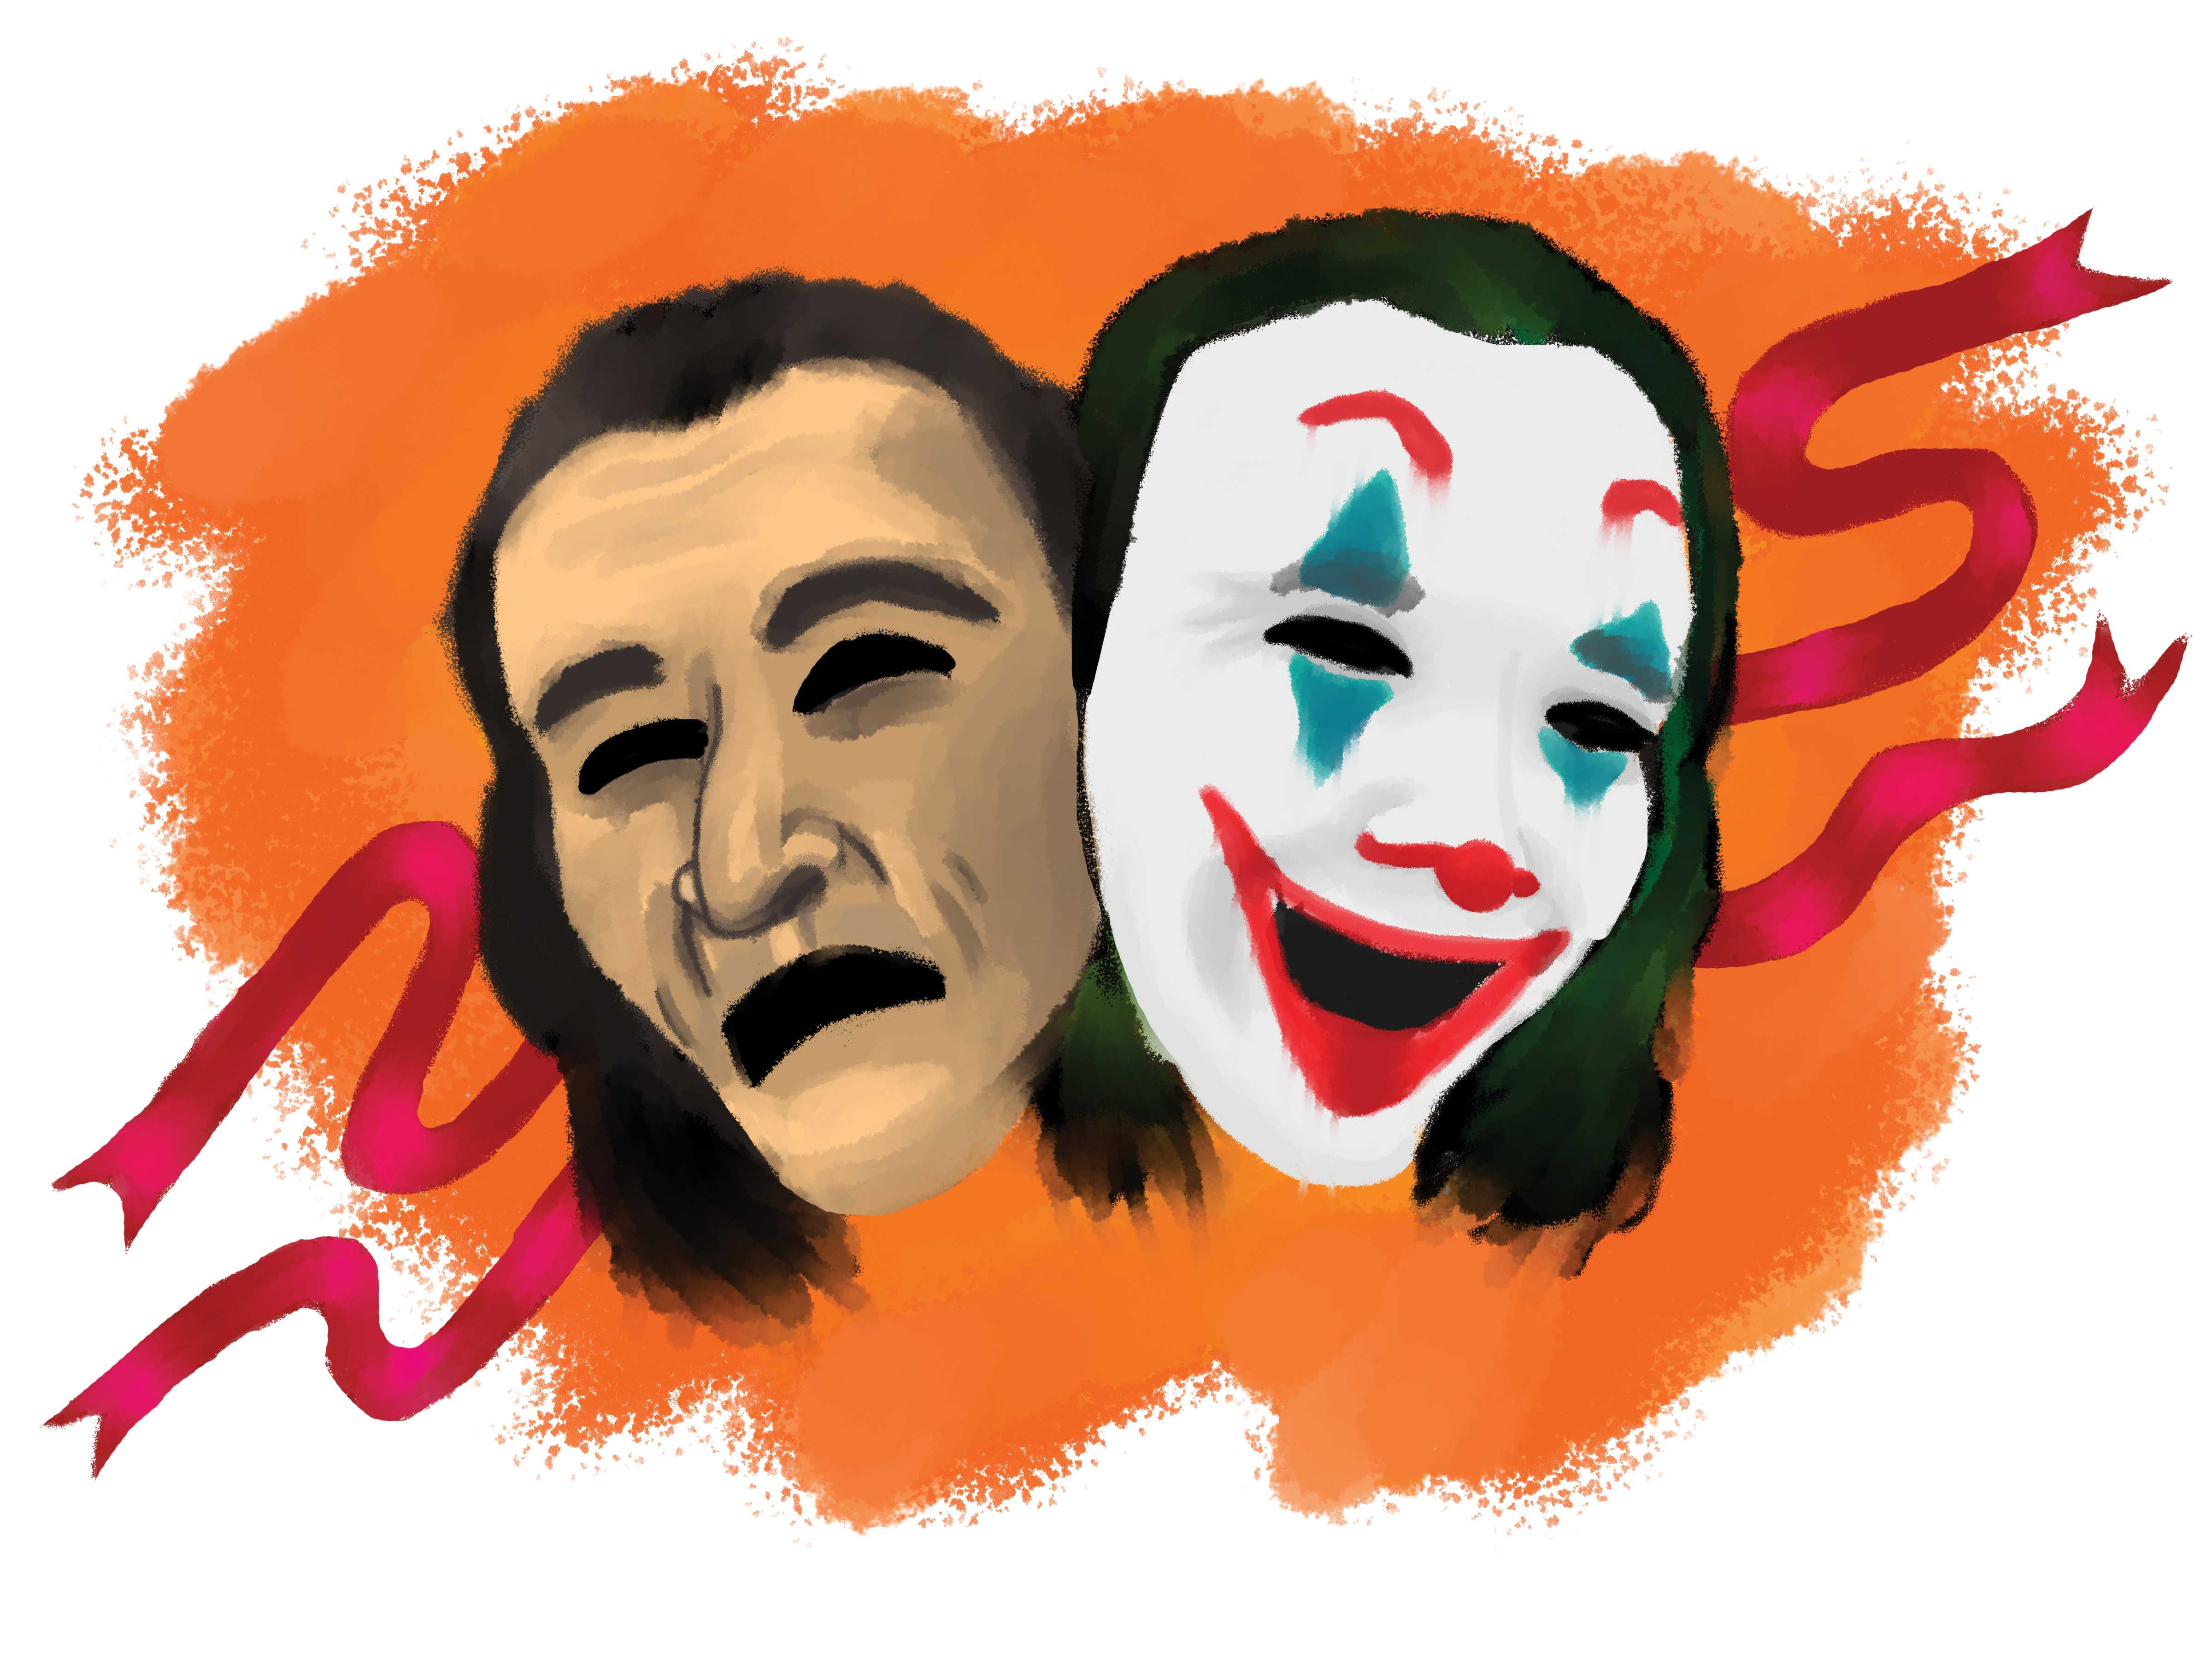 Mental illness in film 'Joker' serious